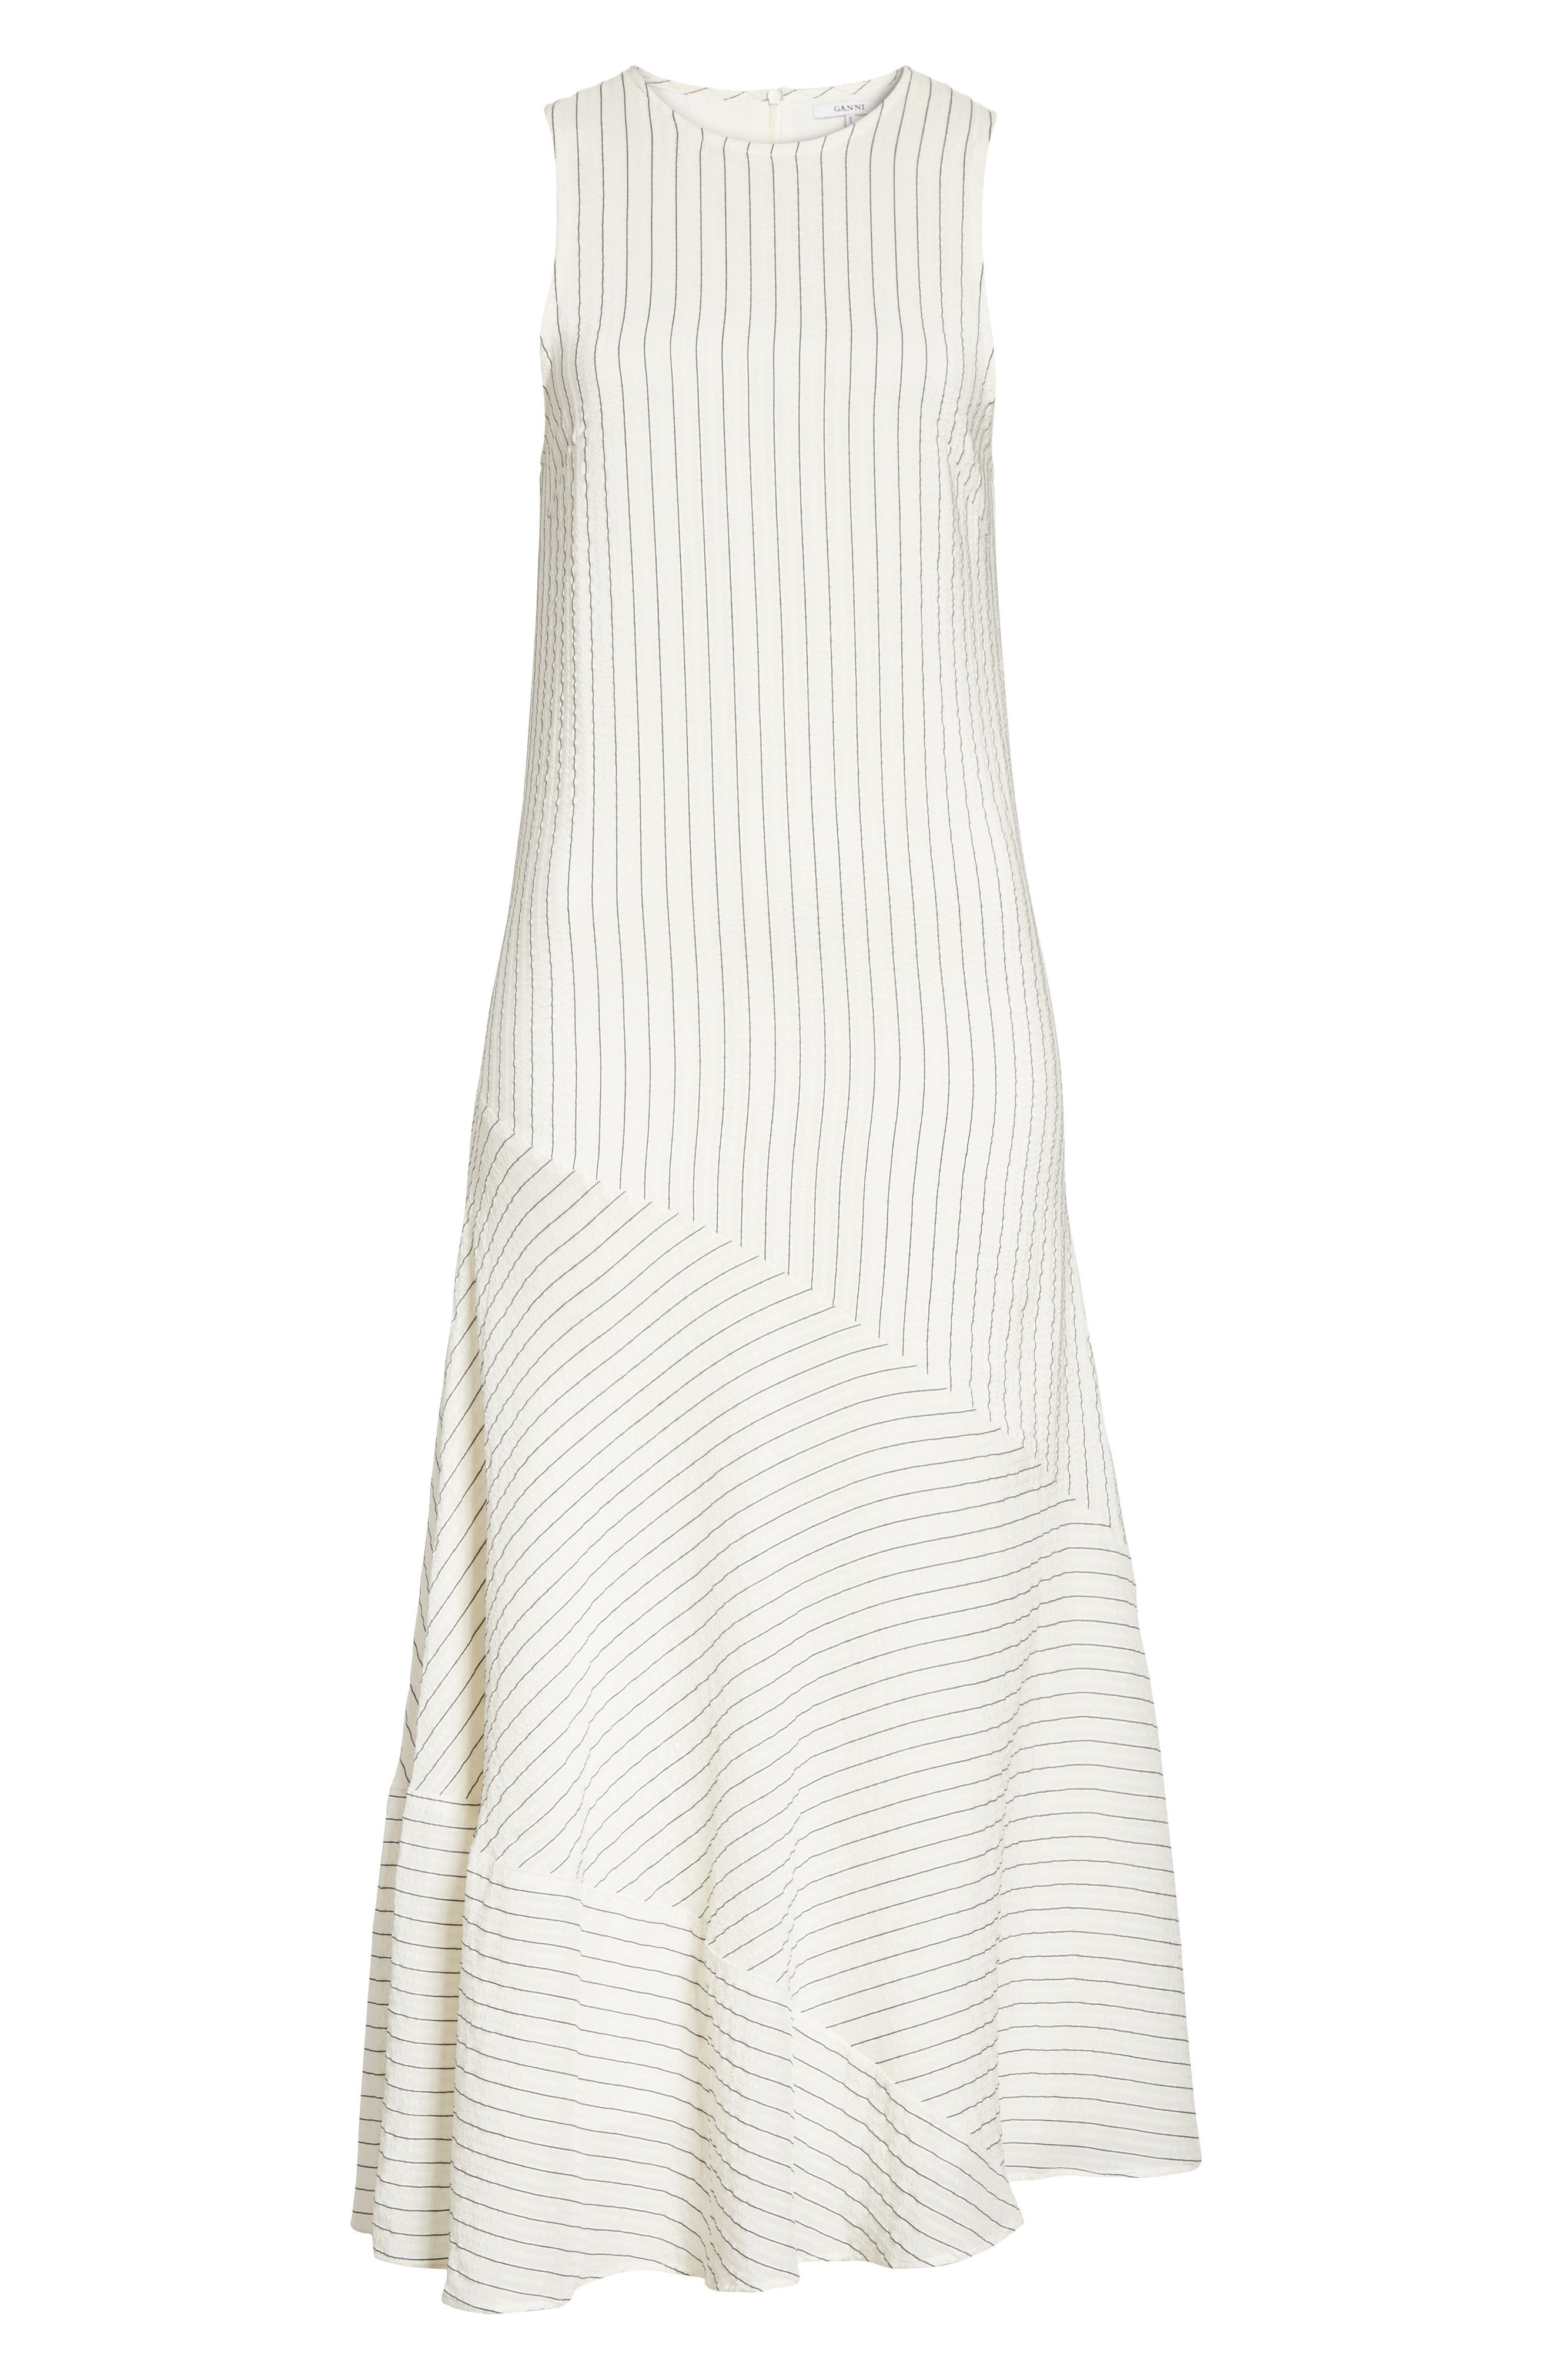 Wilkie Seersucker Striped Sheath Dress,                             Alternate thumbnail 7, color,                             Vanilla Ice